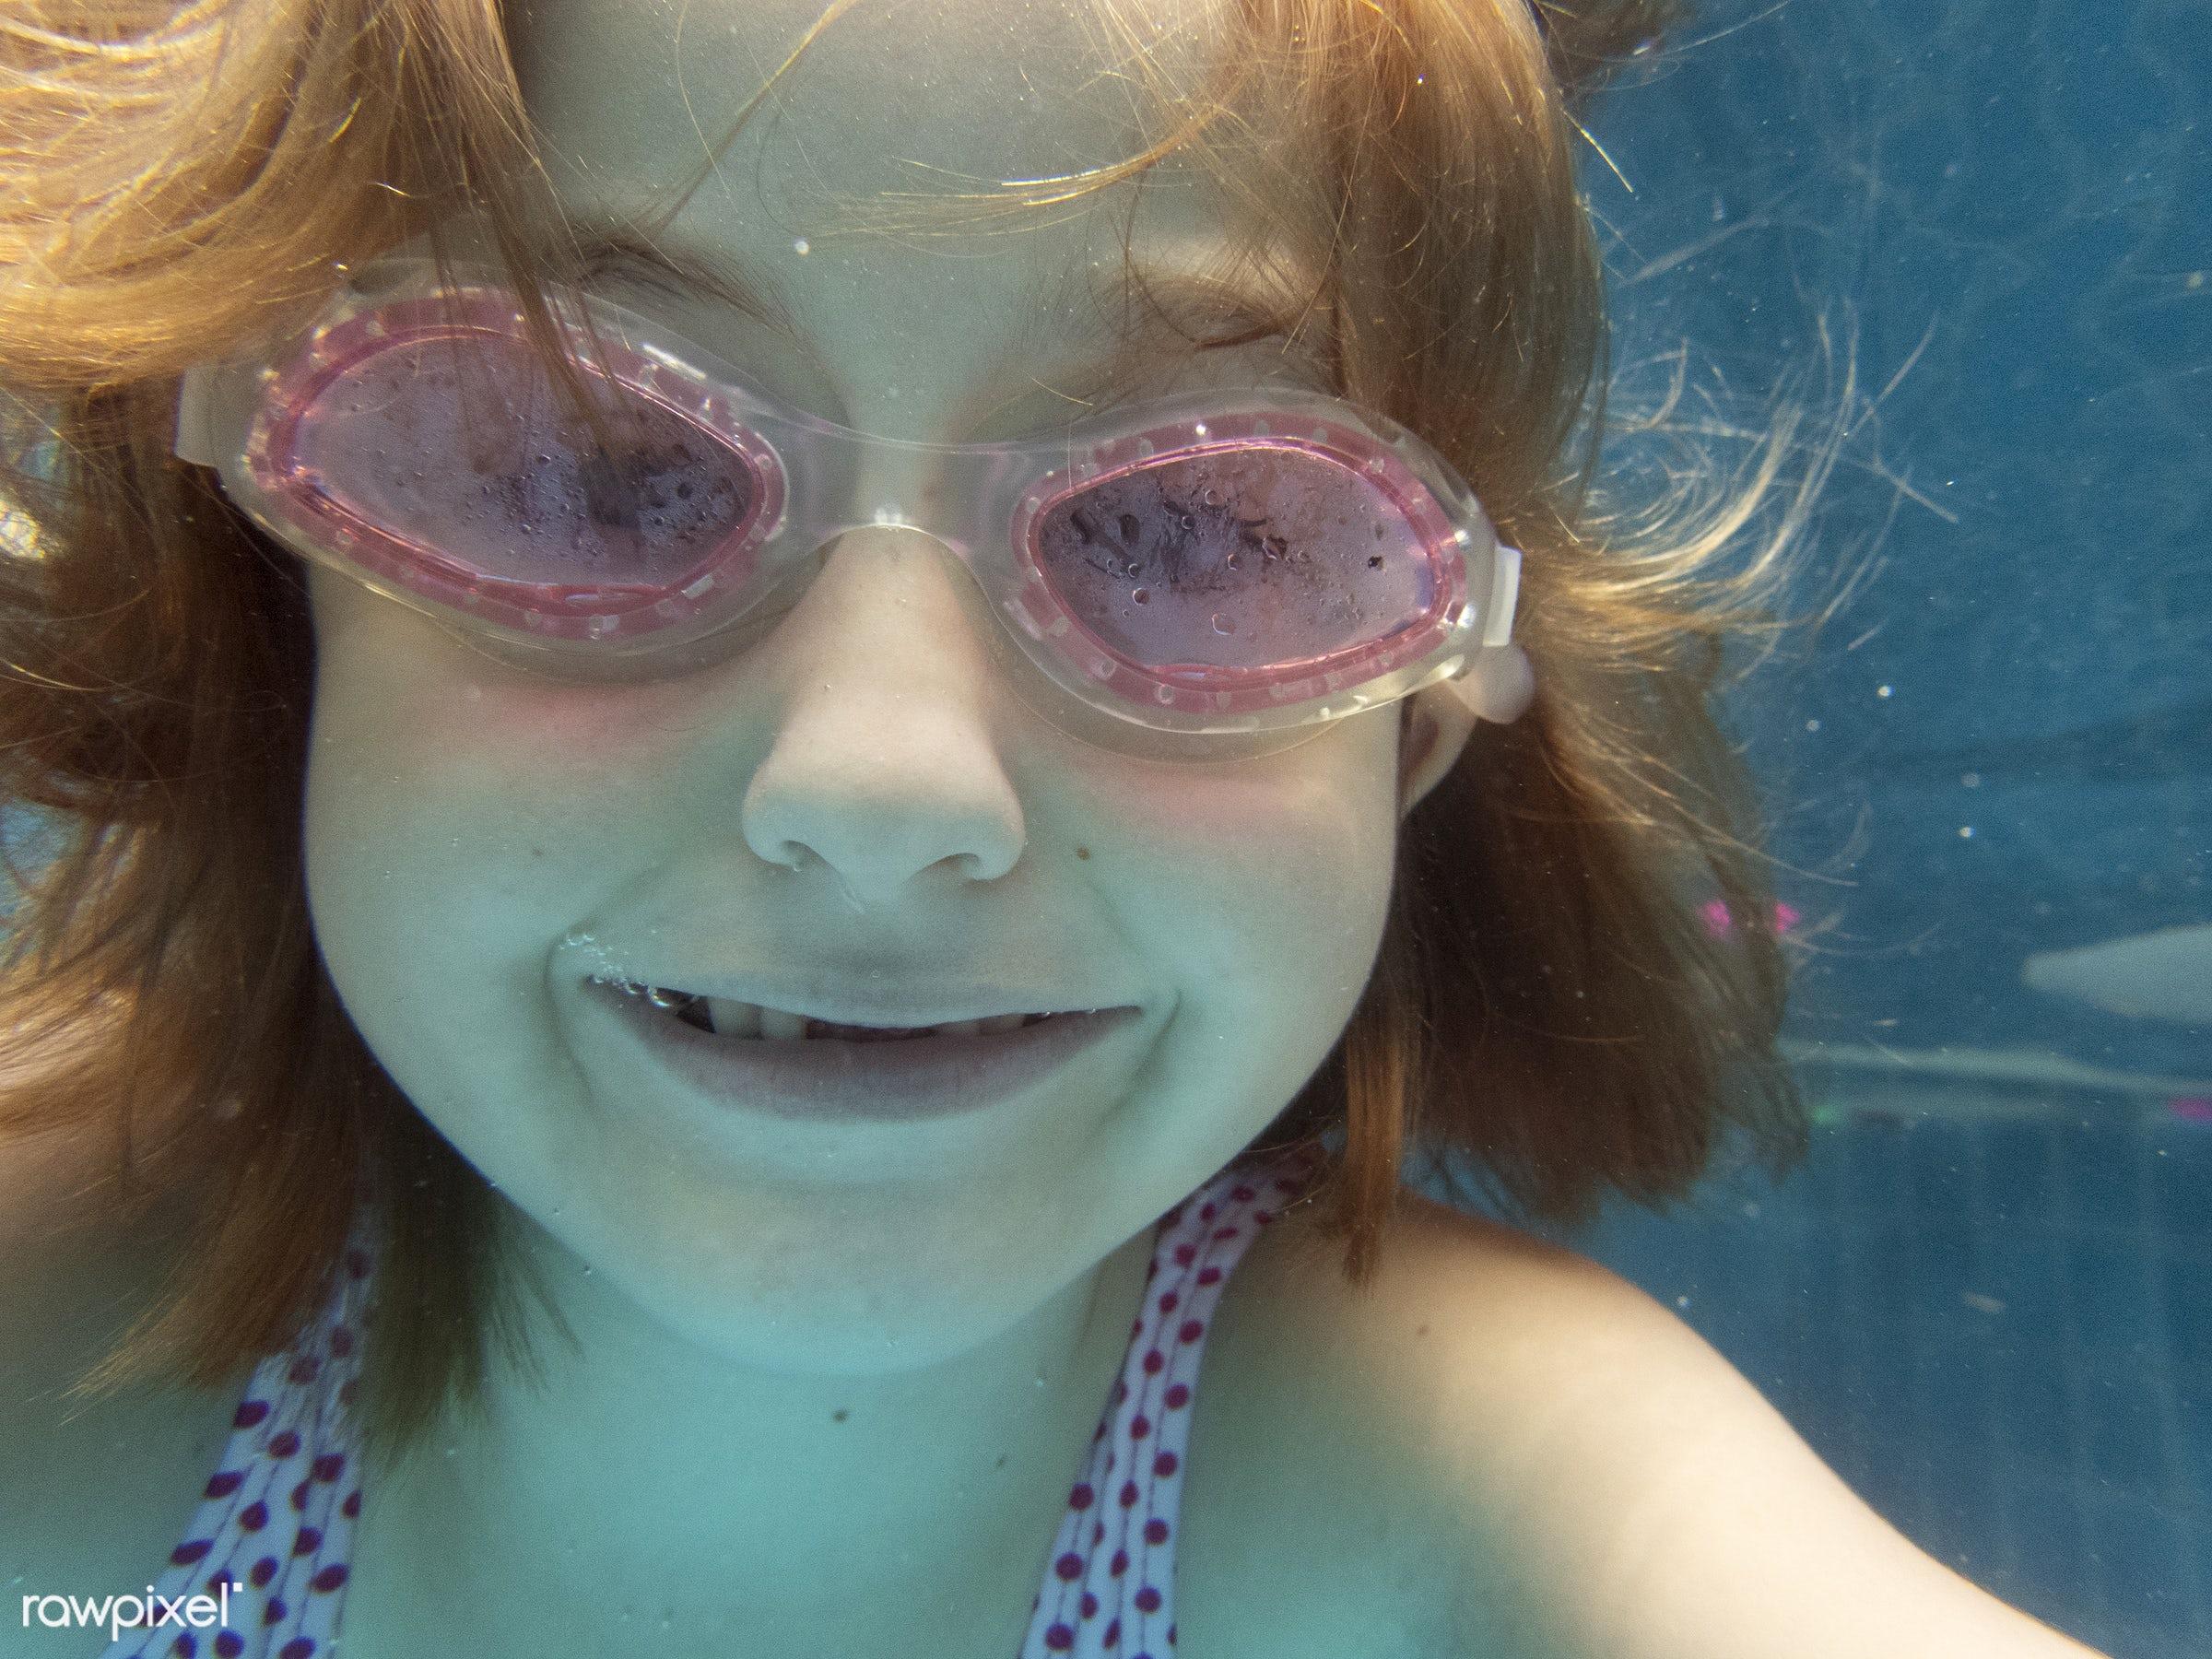 active, casual, cheerful, child, childhood, children, diving, enjoying, enjoyment, fun, girl, goggles, happiness, happy, joy...